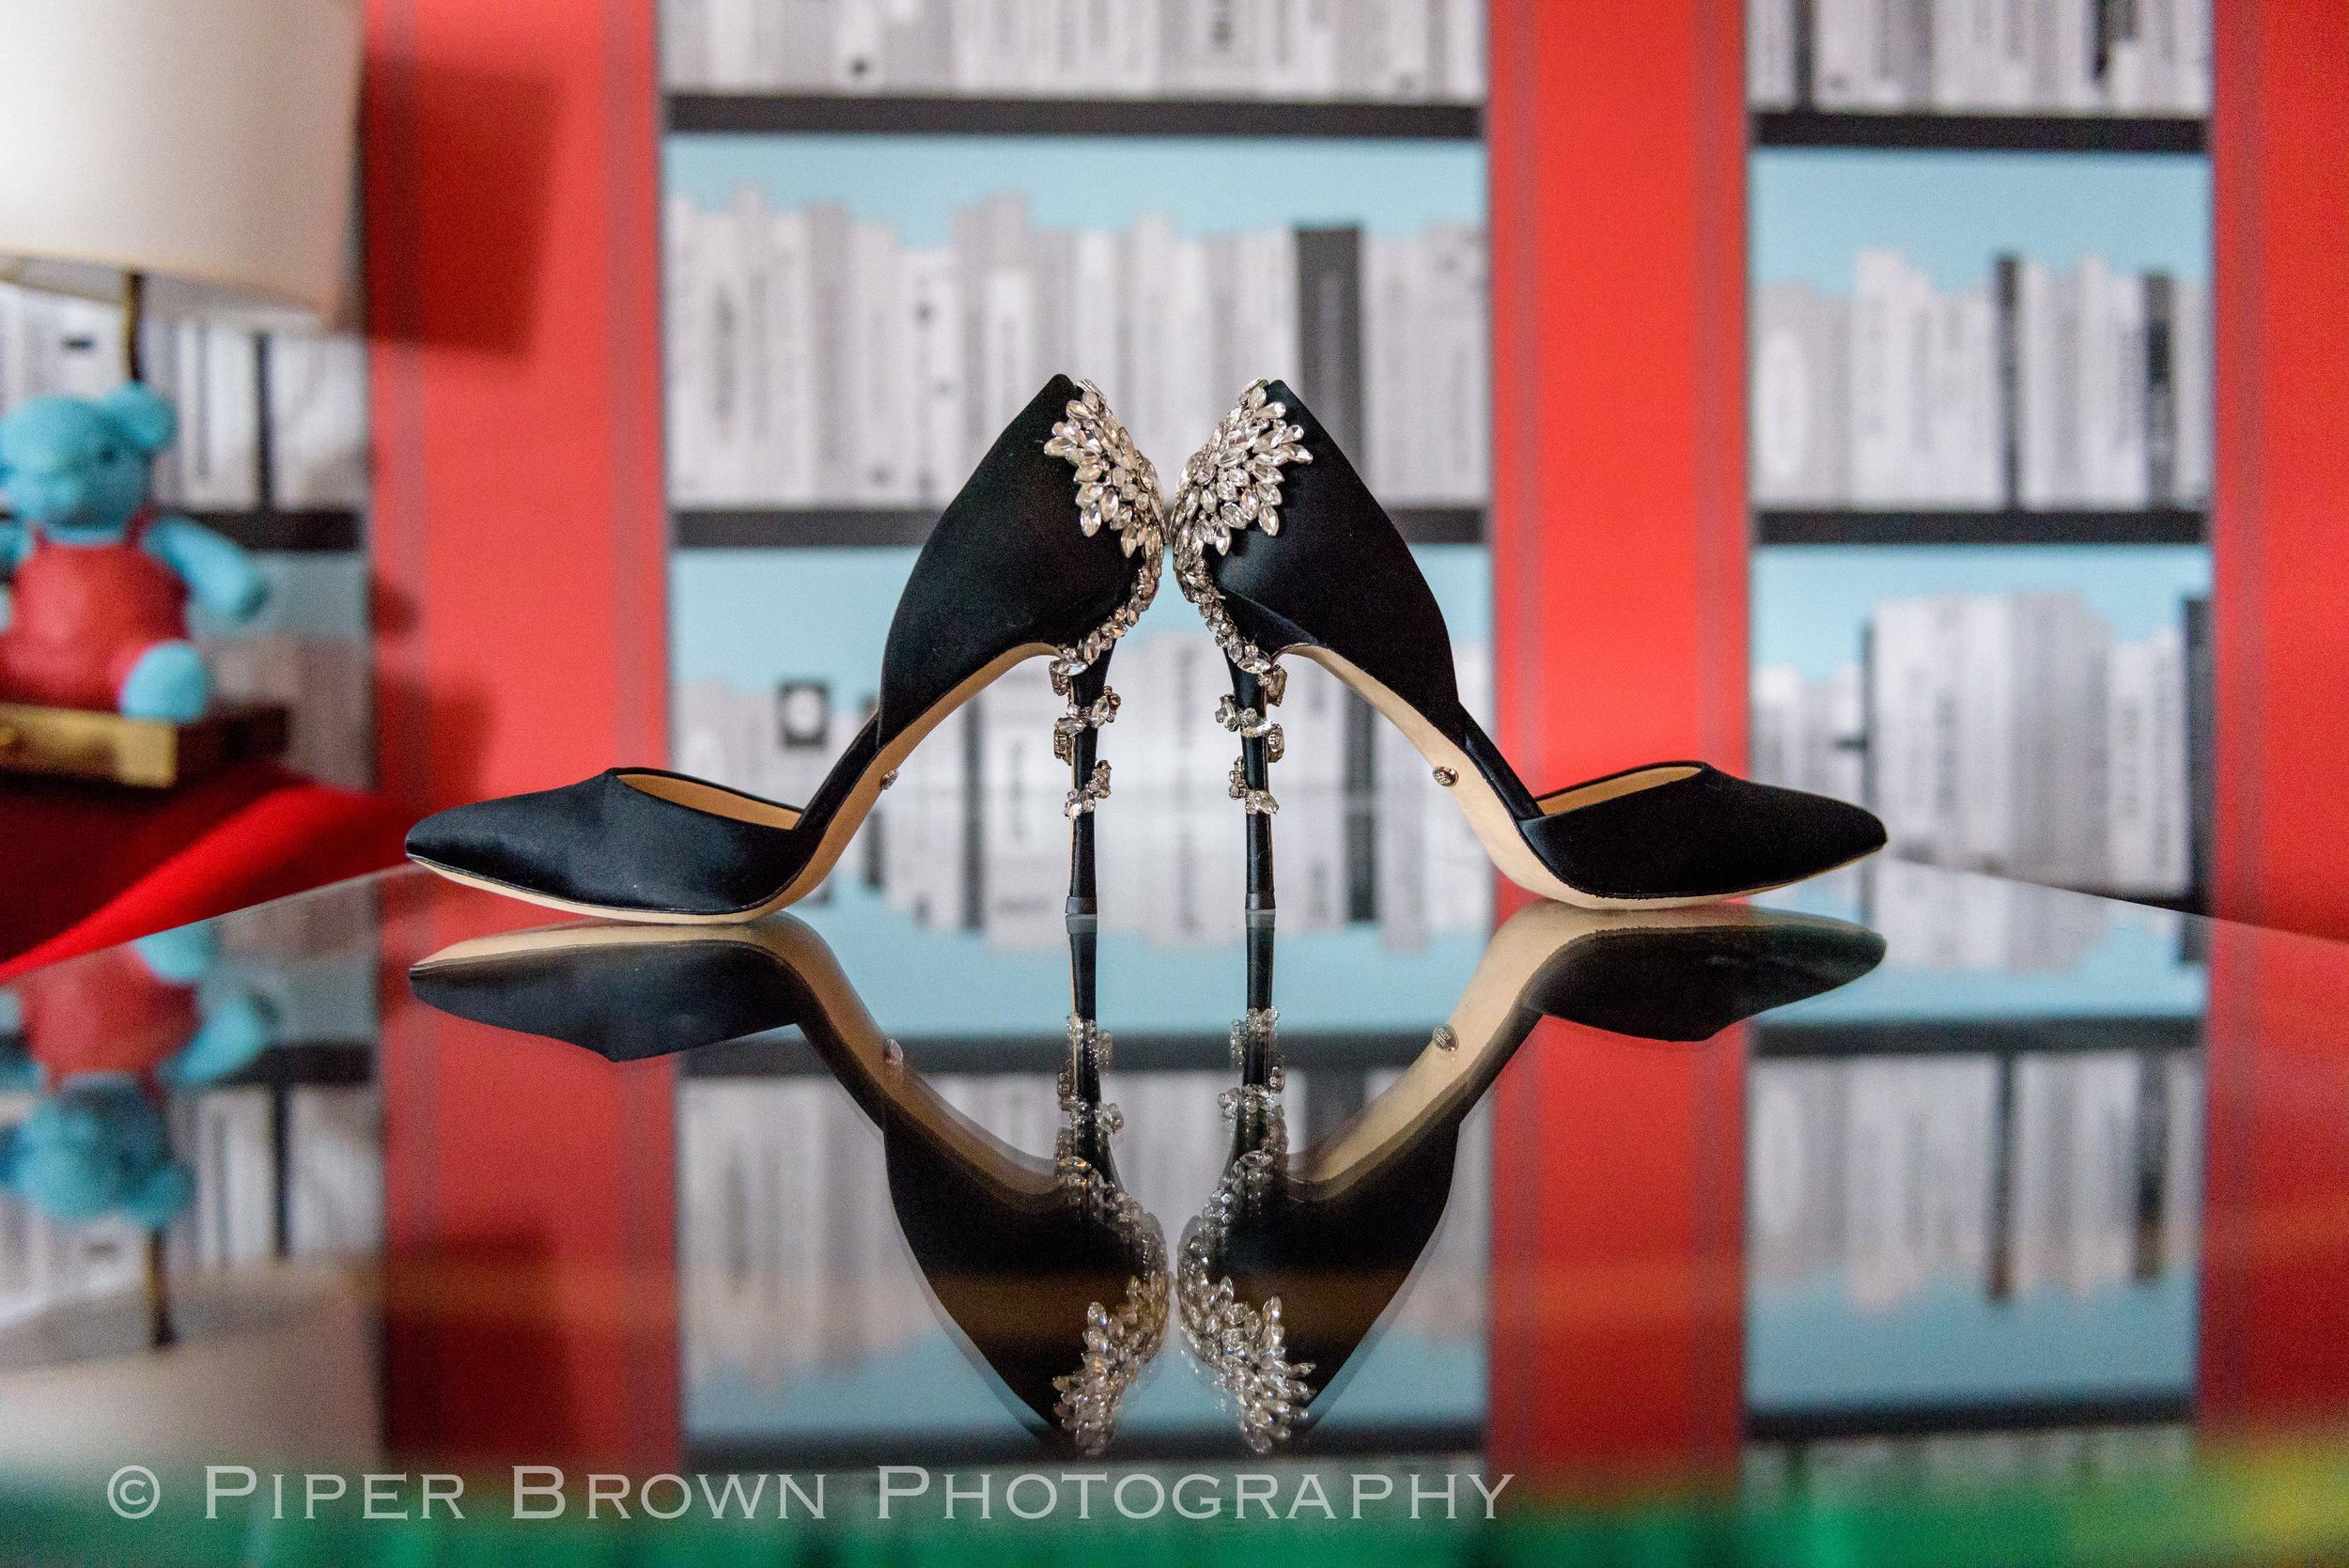 Badgley Mischka Vogue D'Orsay Evening Shoe